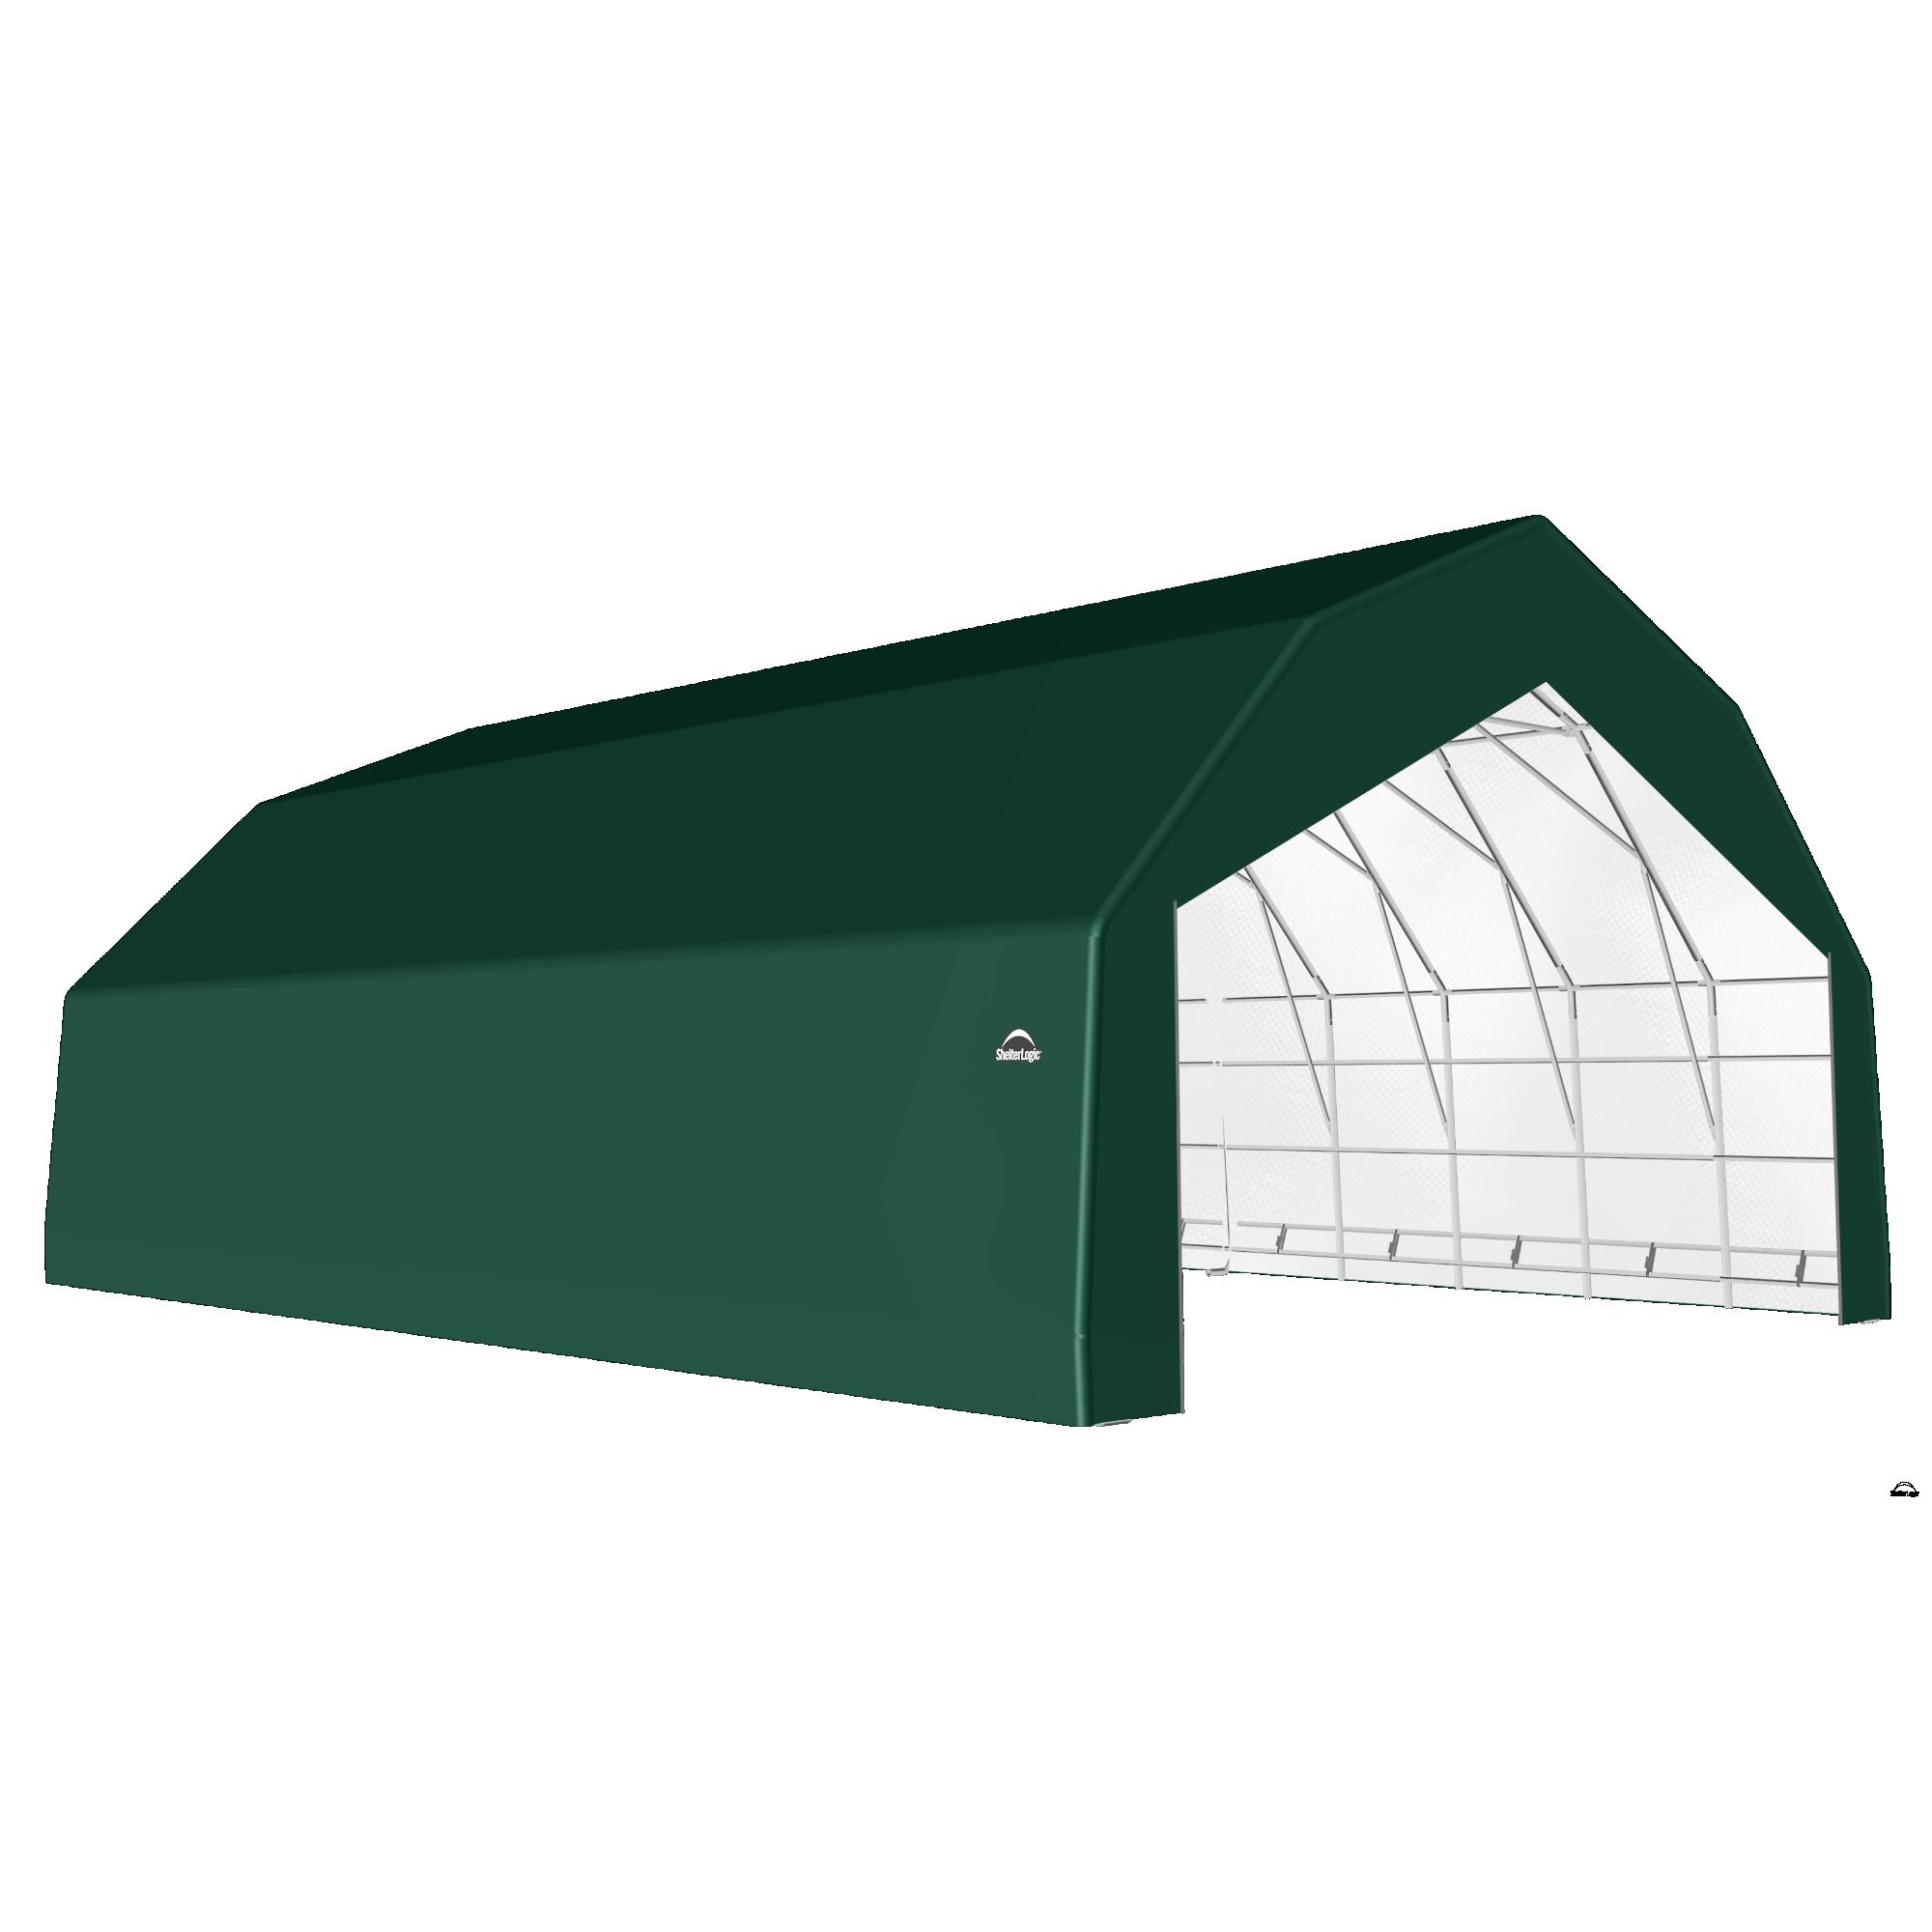 SP Barn 30X36X18 Green 14 oz PE Shelter